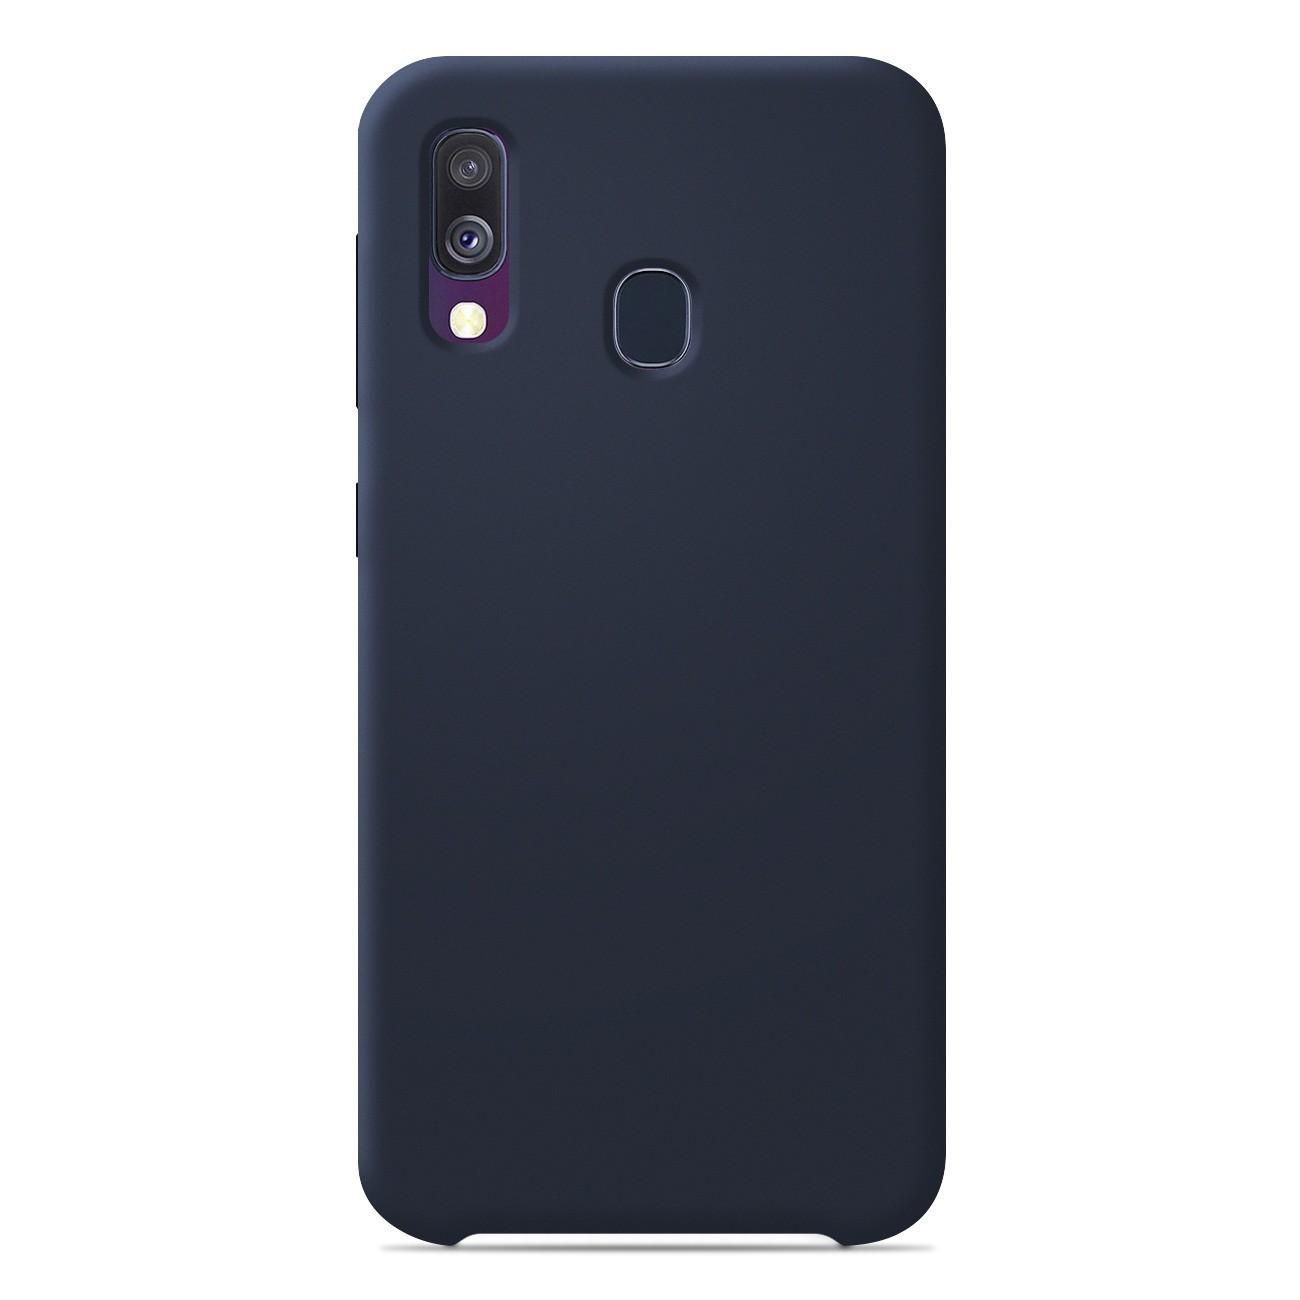 Coque Samsung Galaxy A40 Silicone Soft Touch - Bleu nuit